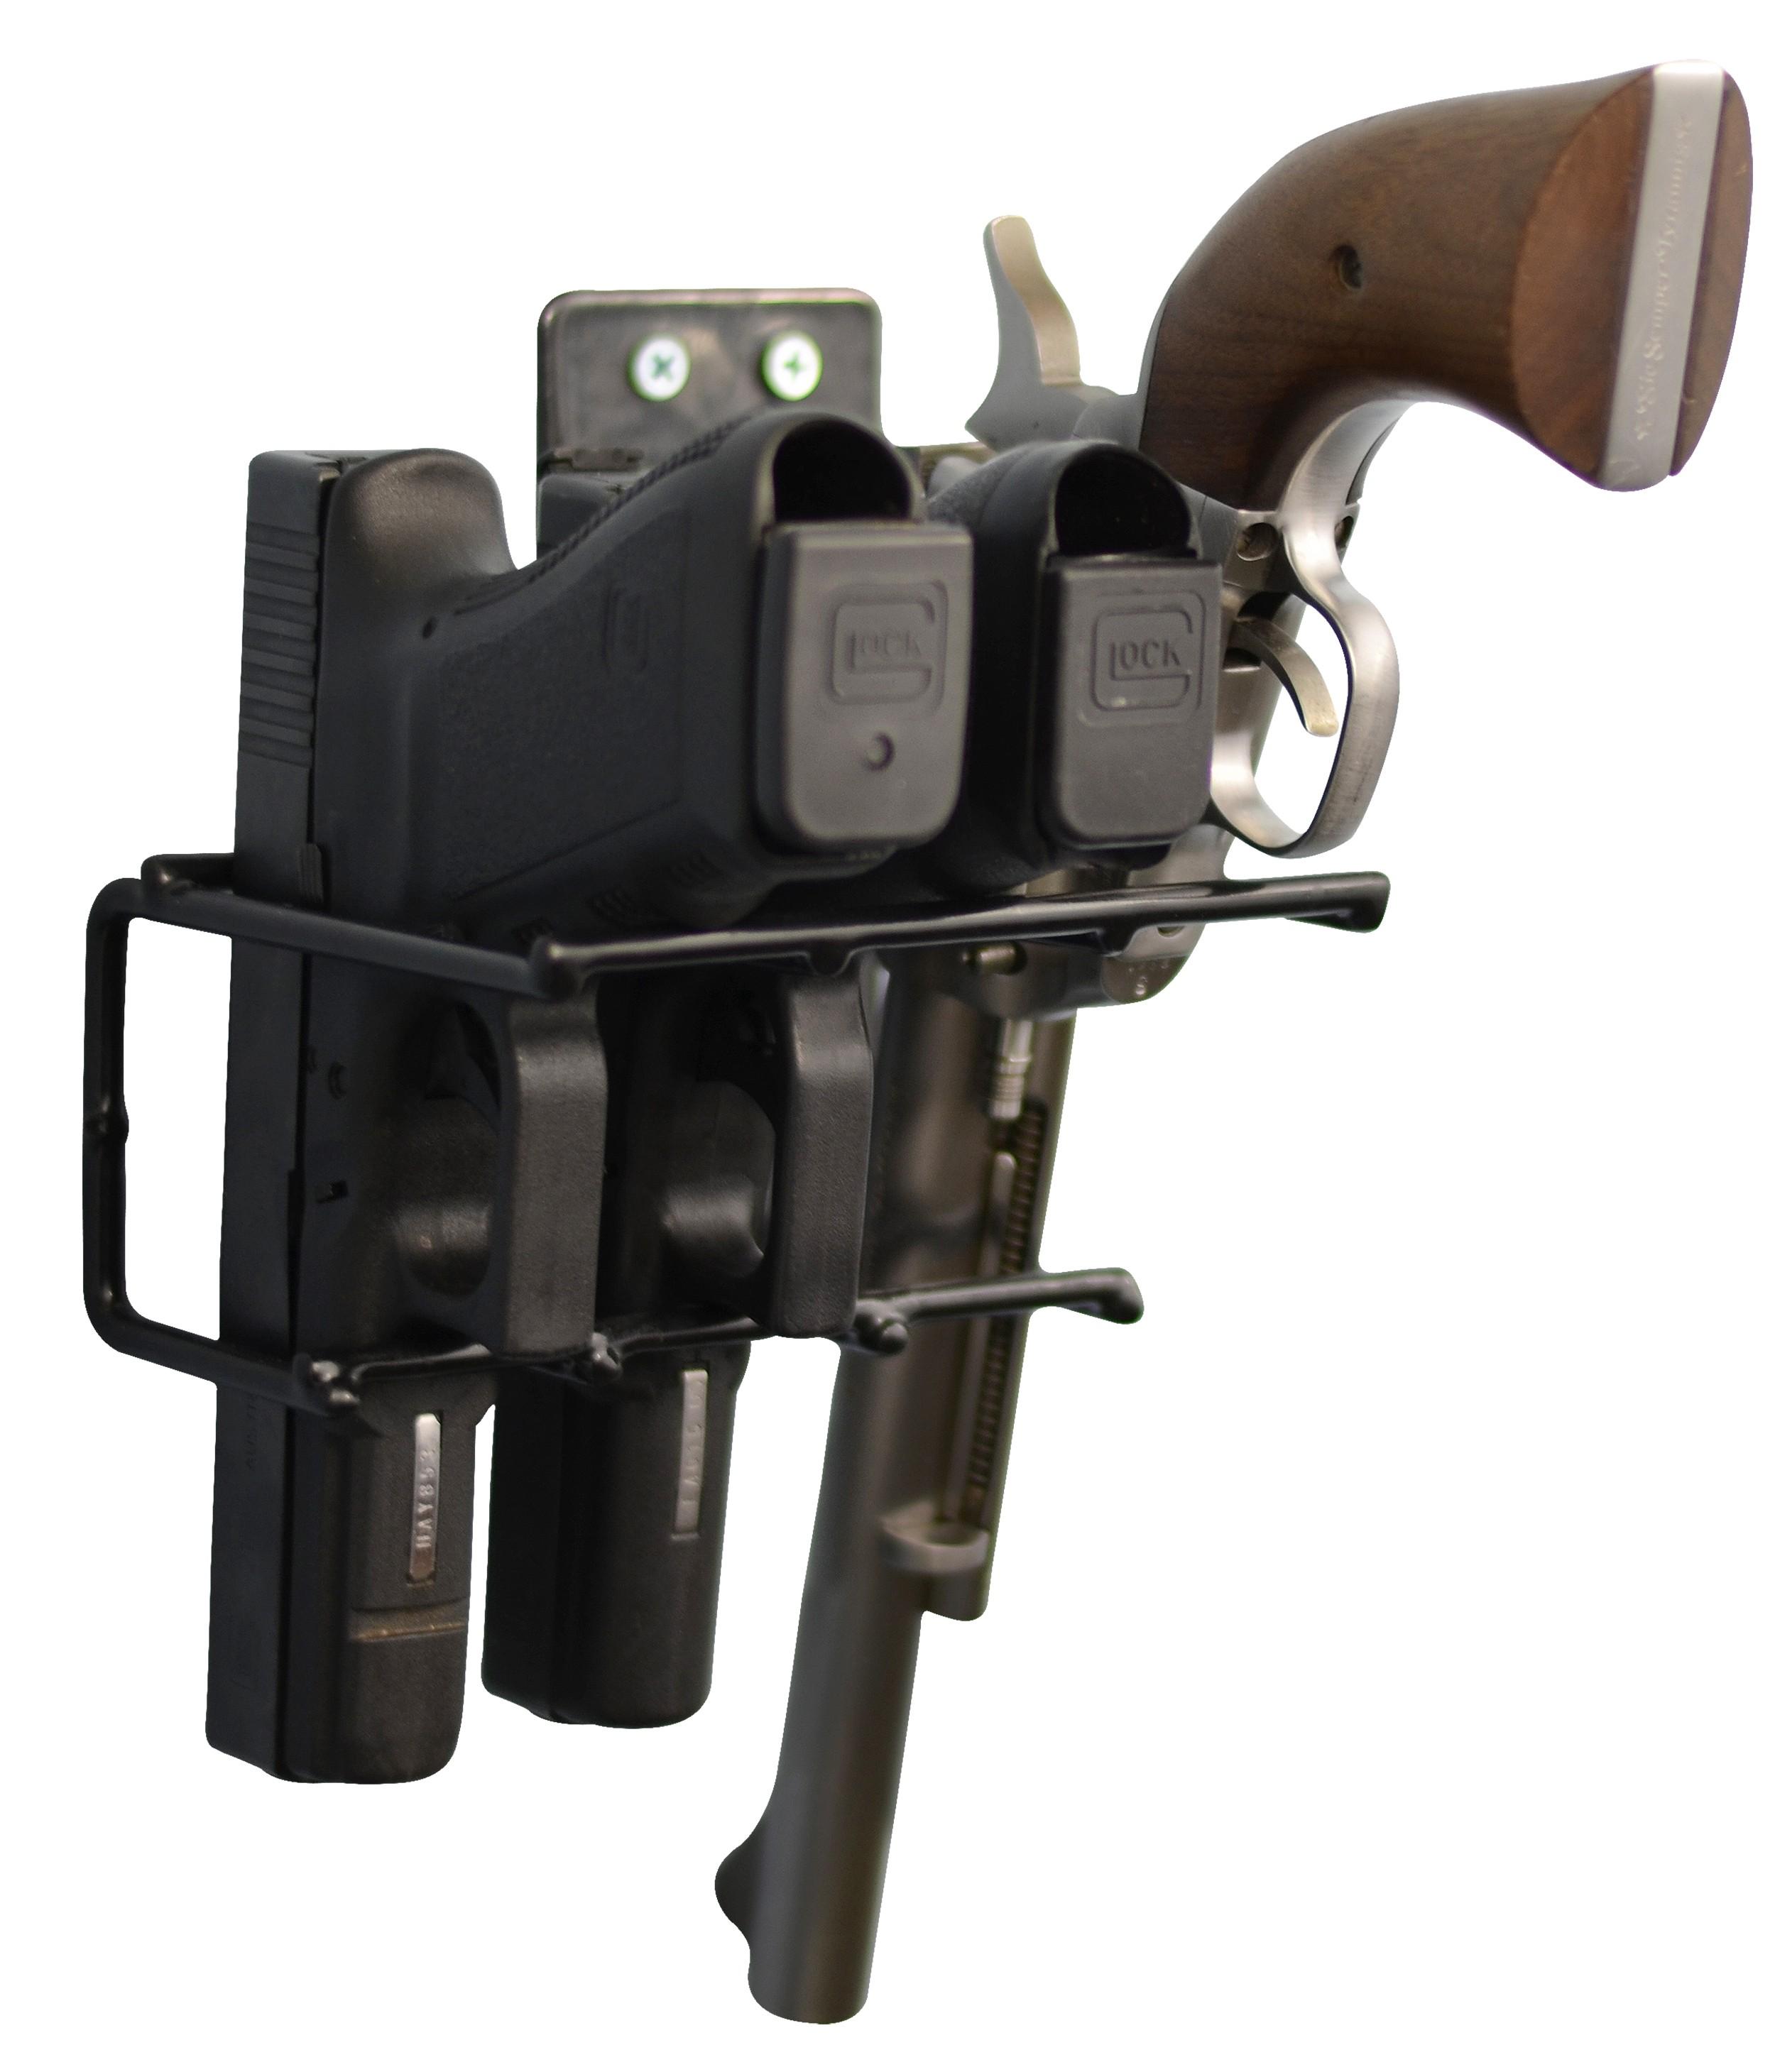 Handgun Wall Mount Rack 3 Gun Model, Black